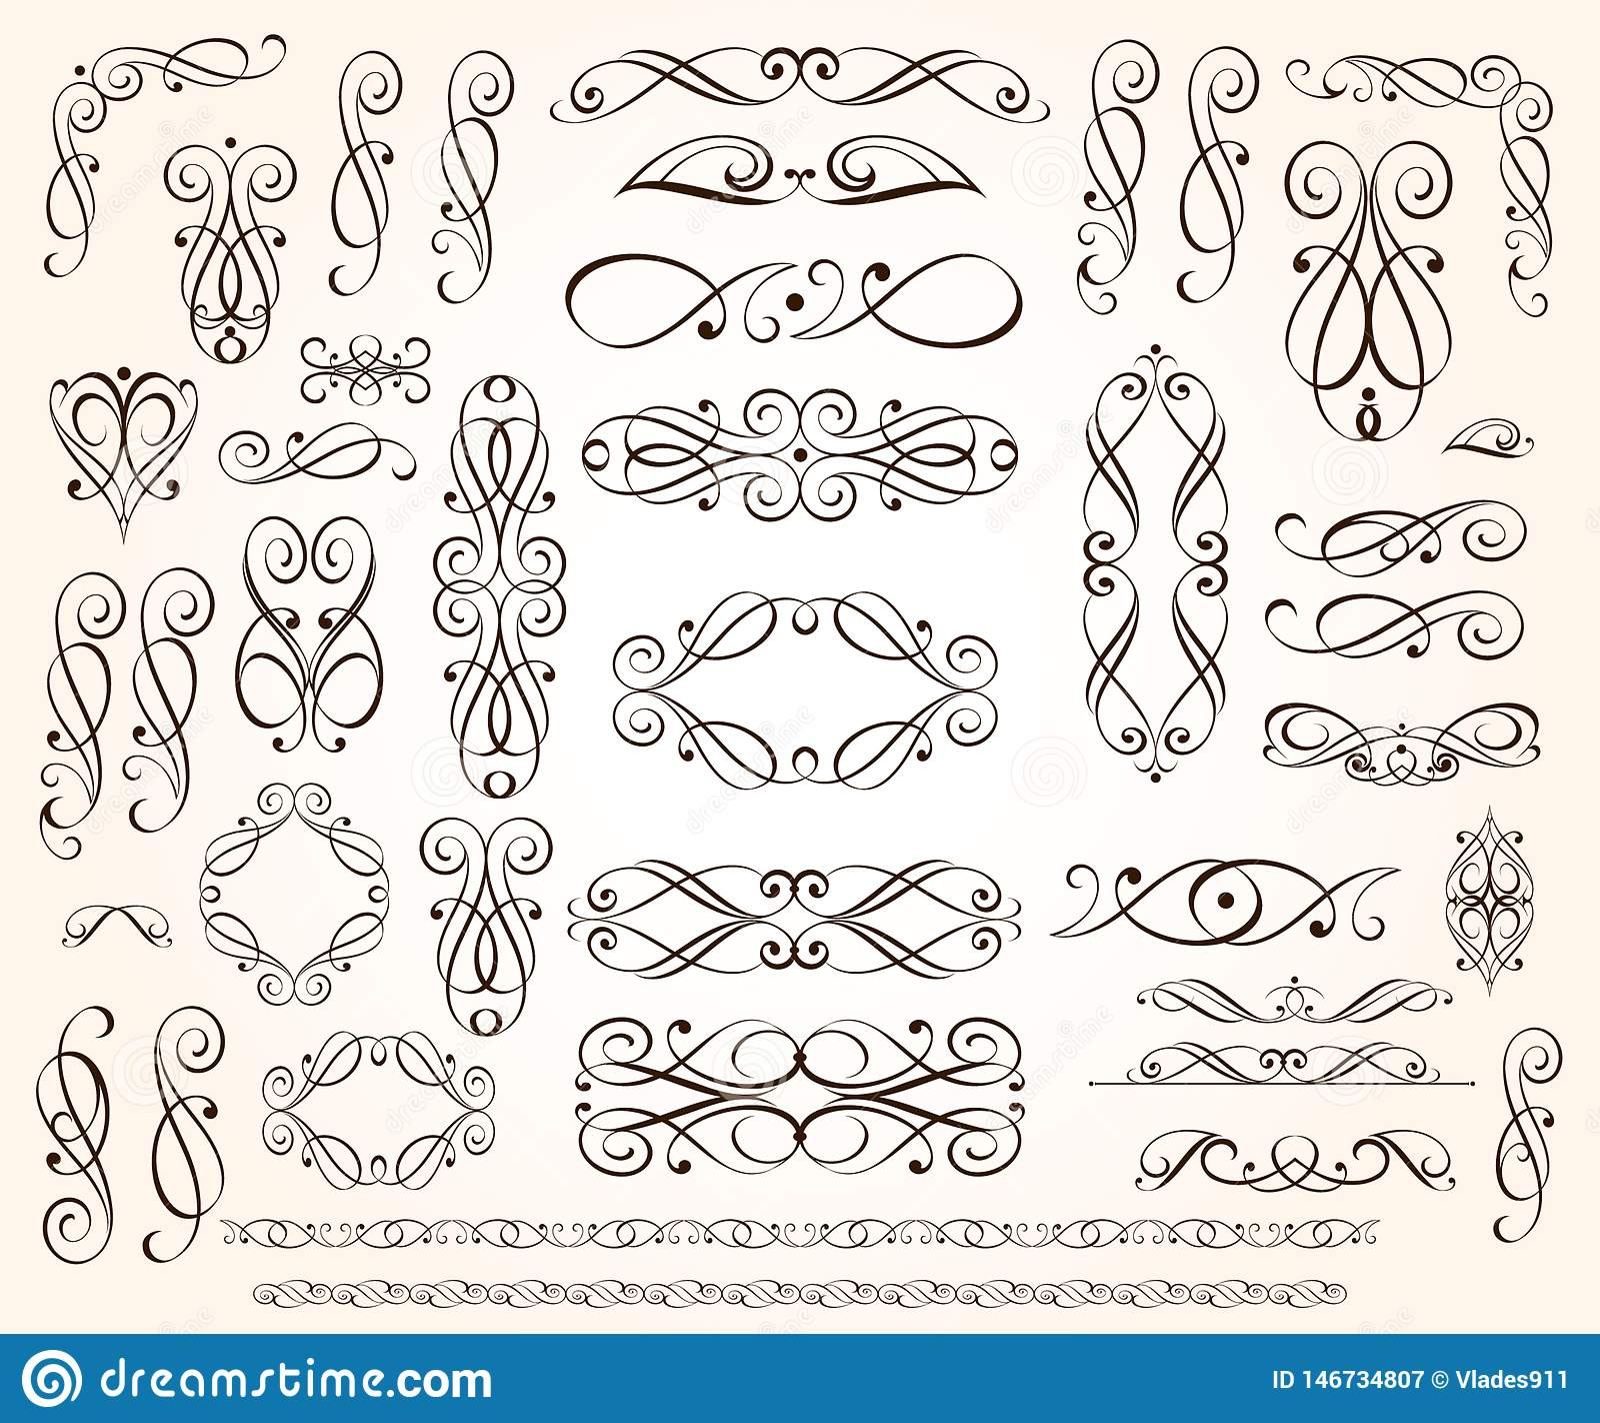 Set of elegant decorative scroll elements. Vector illustration.Black